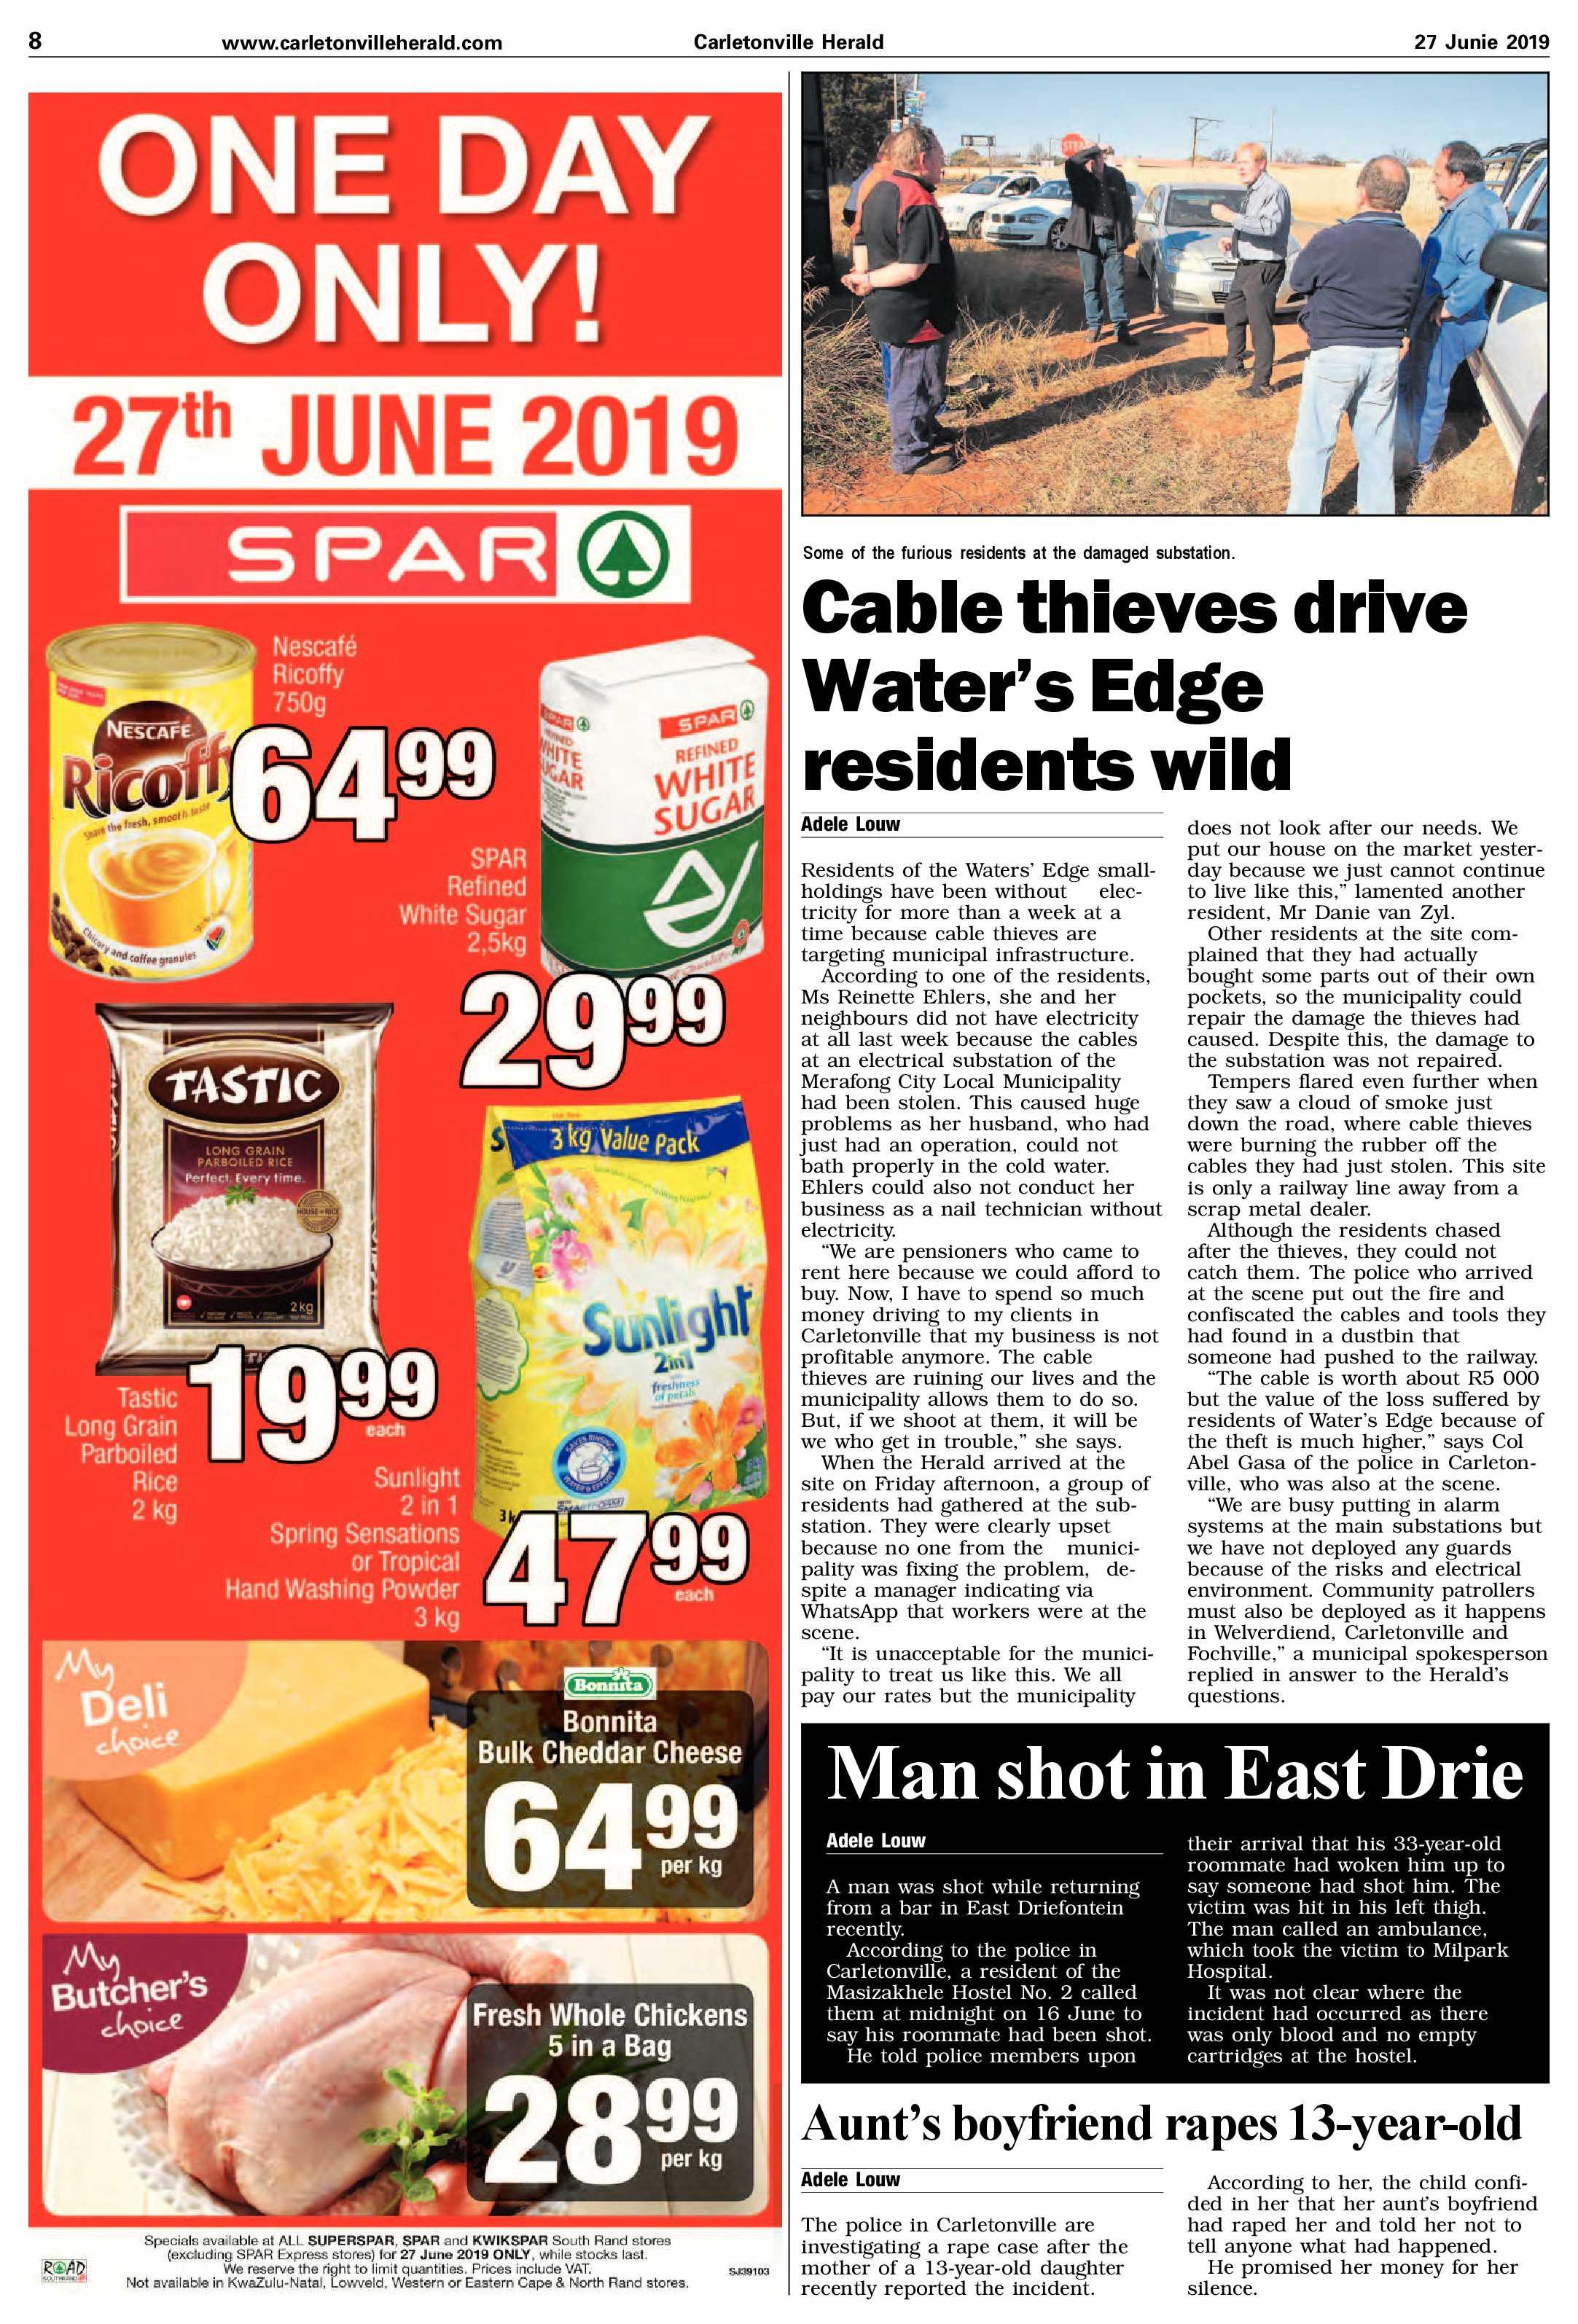 27 June 2019 | Carletonville Herald